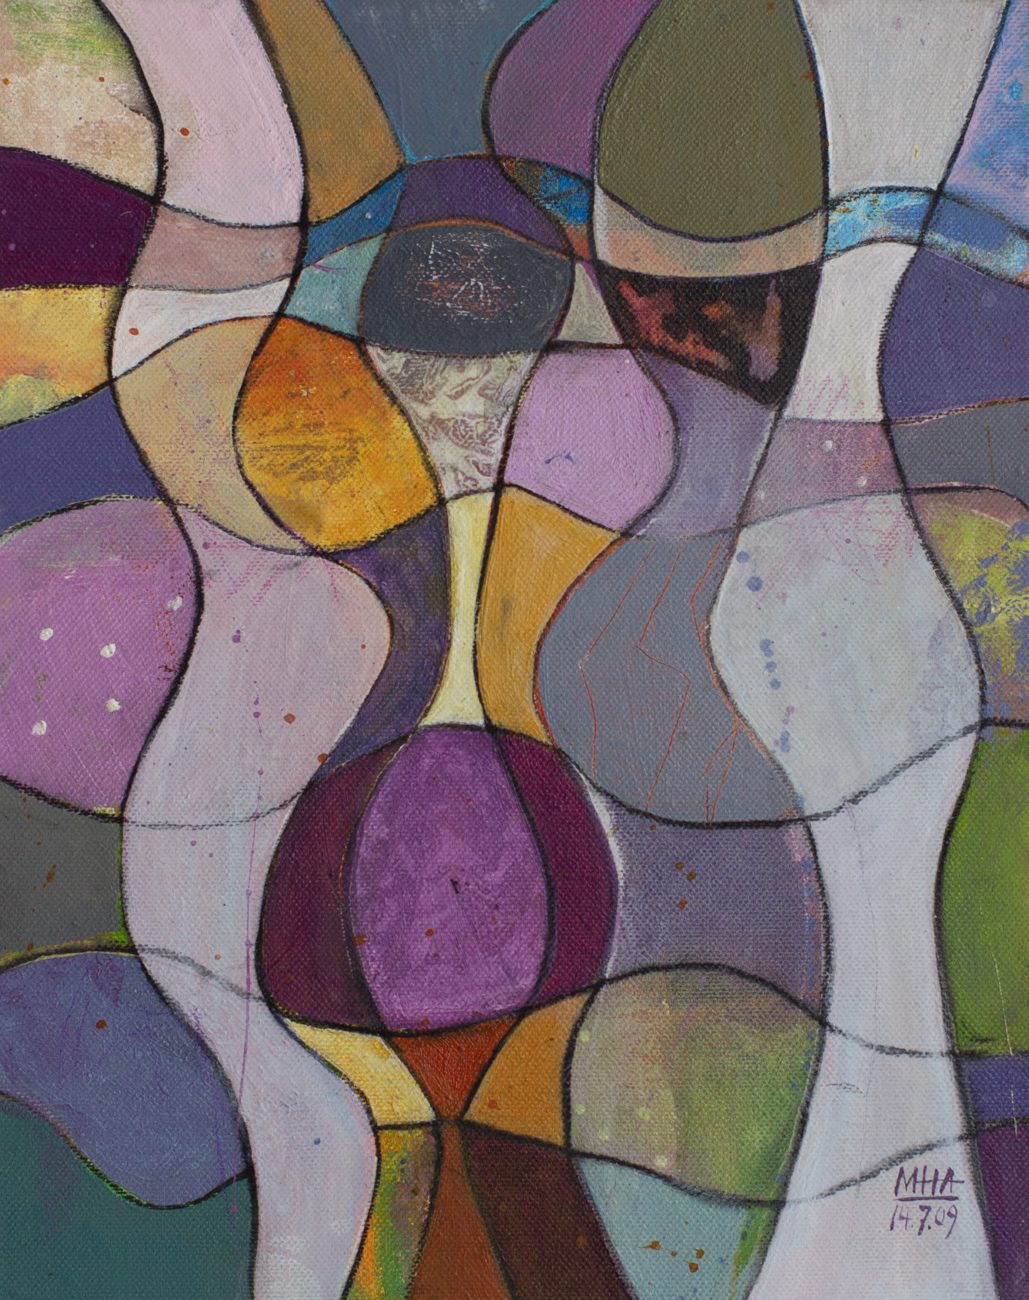 Fantasie in Linien 17 , 2009,Acryl auf Leinwand, 24x30 cm